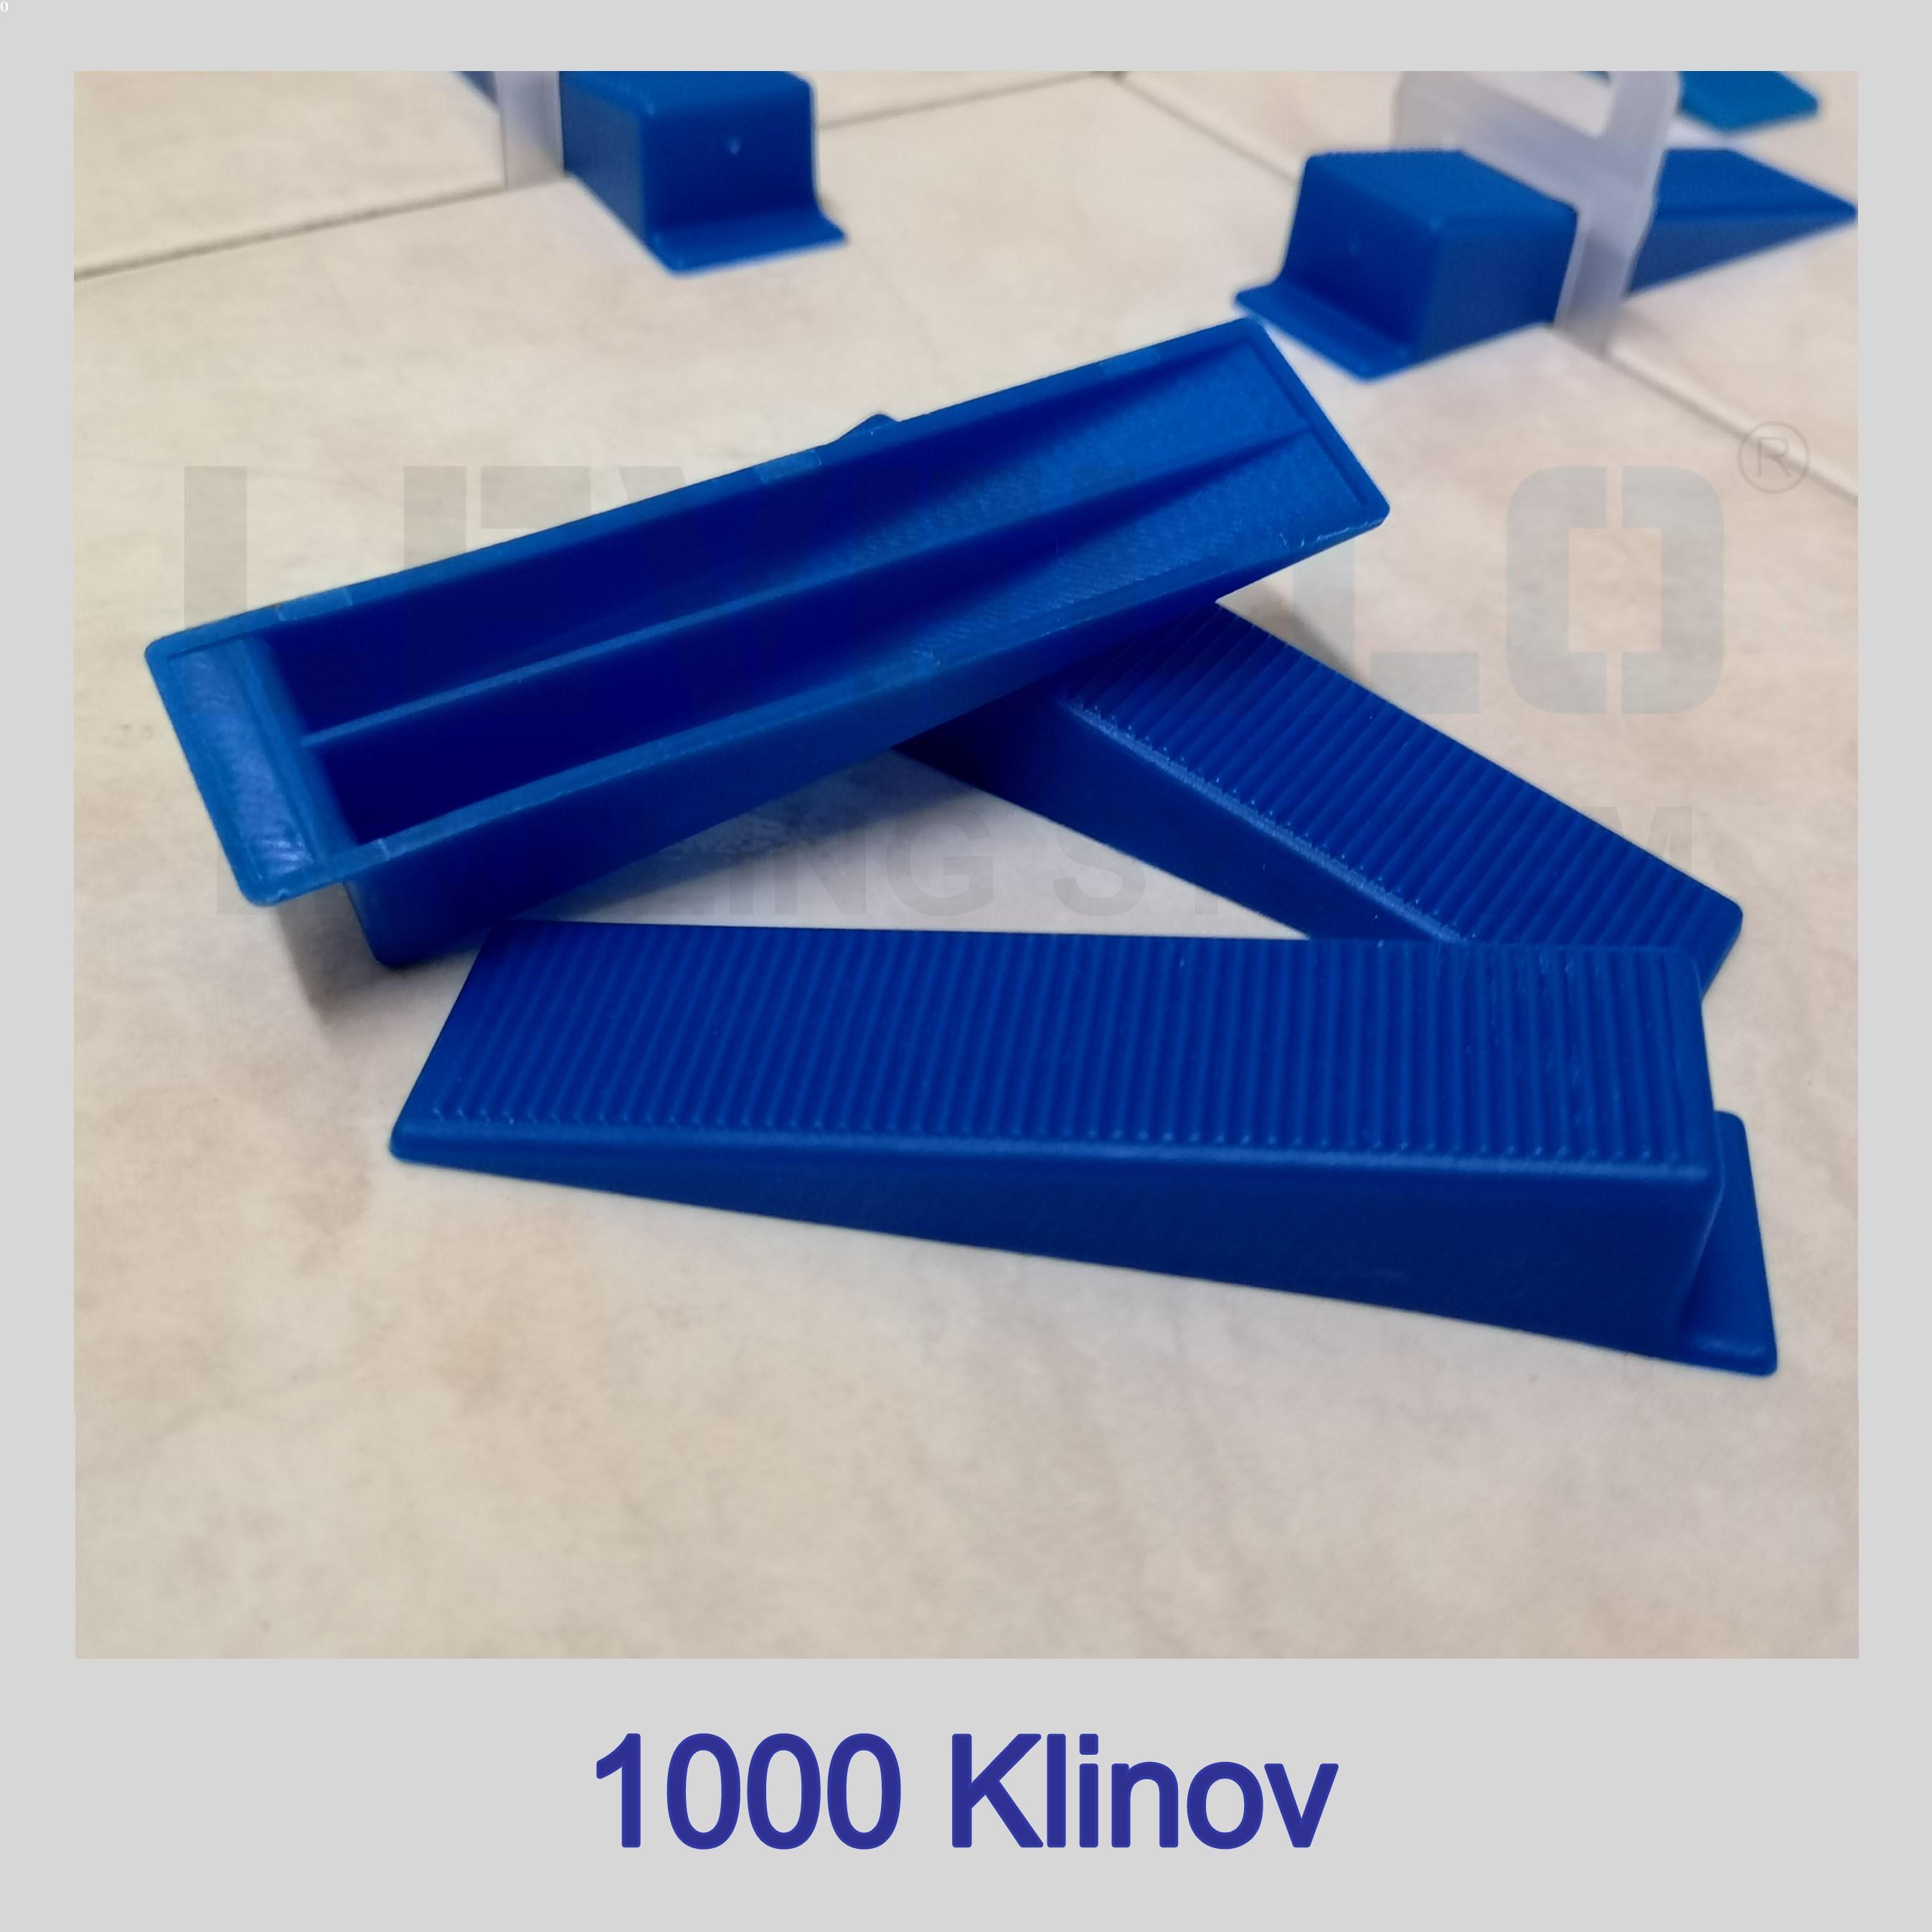 Nivelačné kliny modré, 1000 kusov